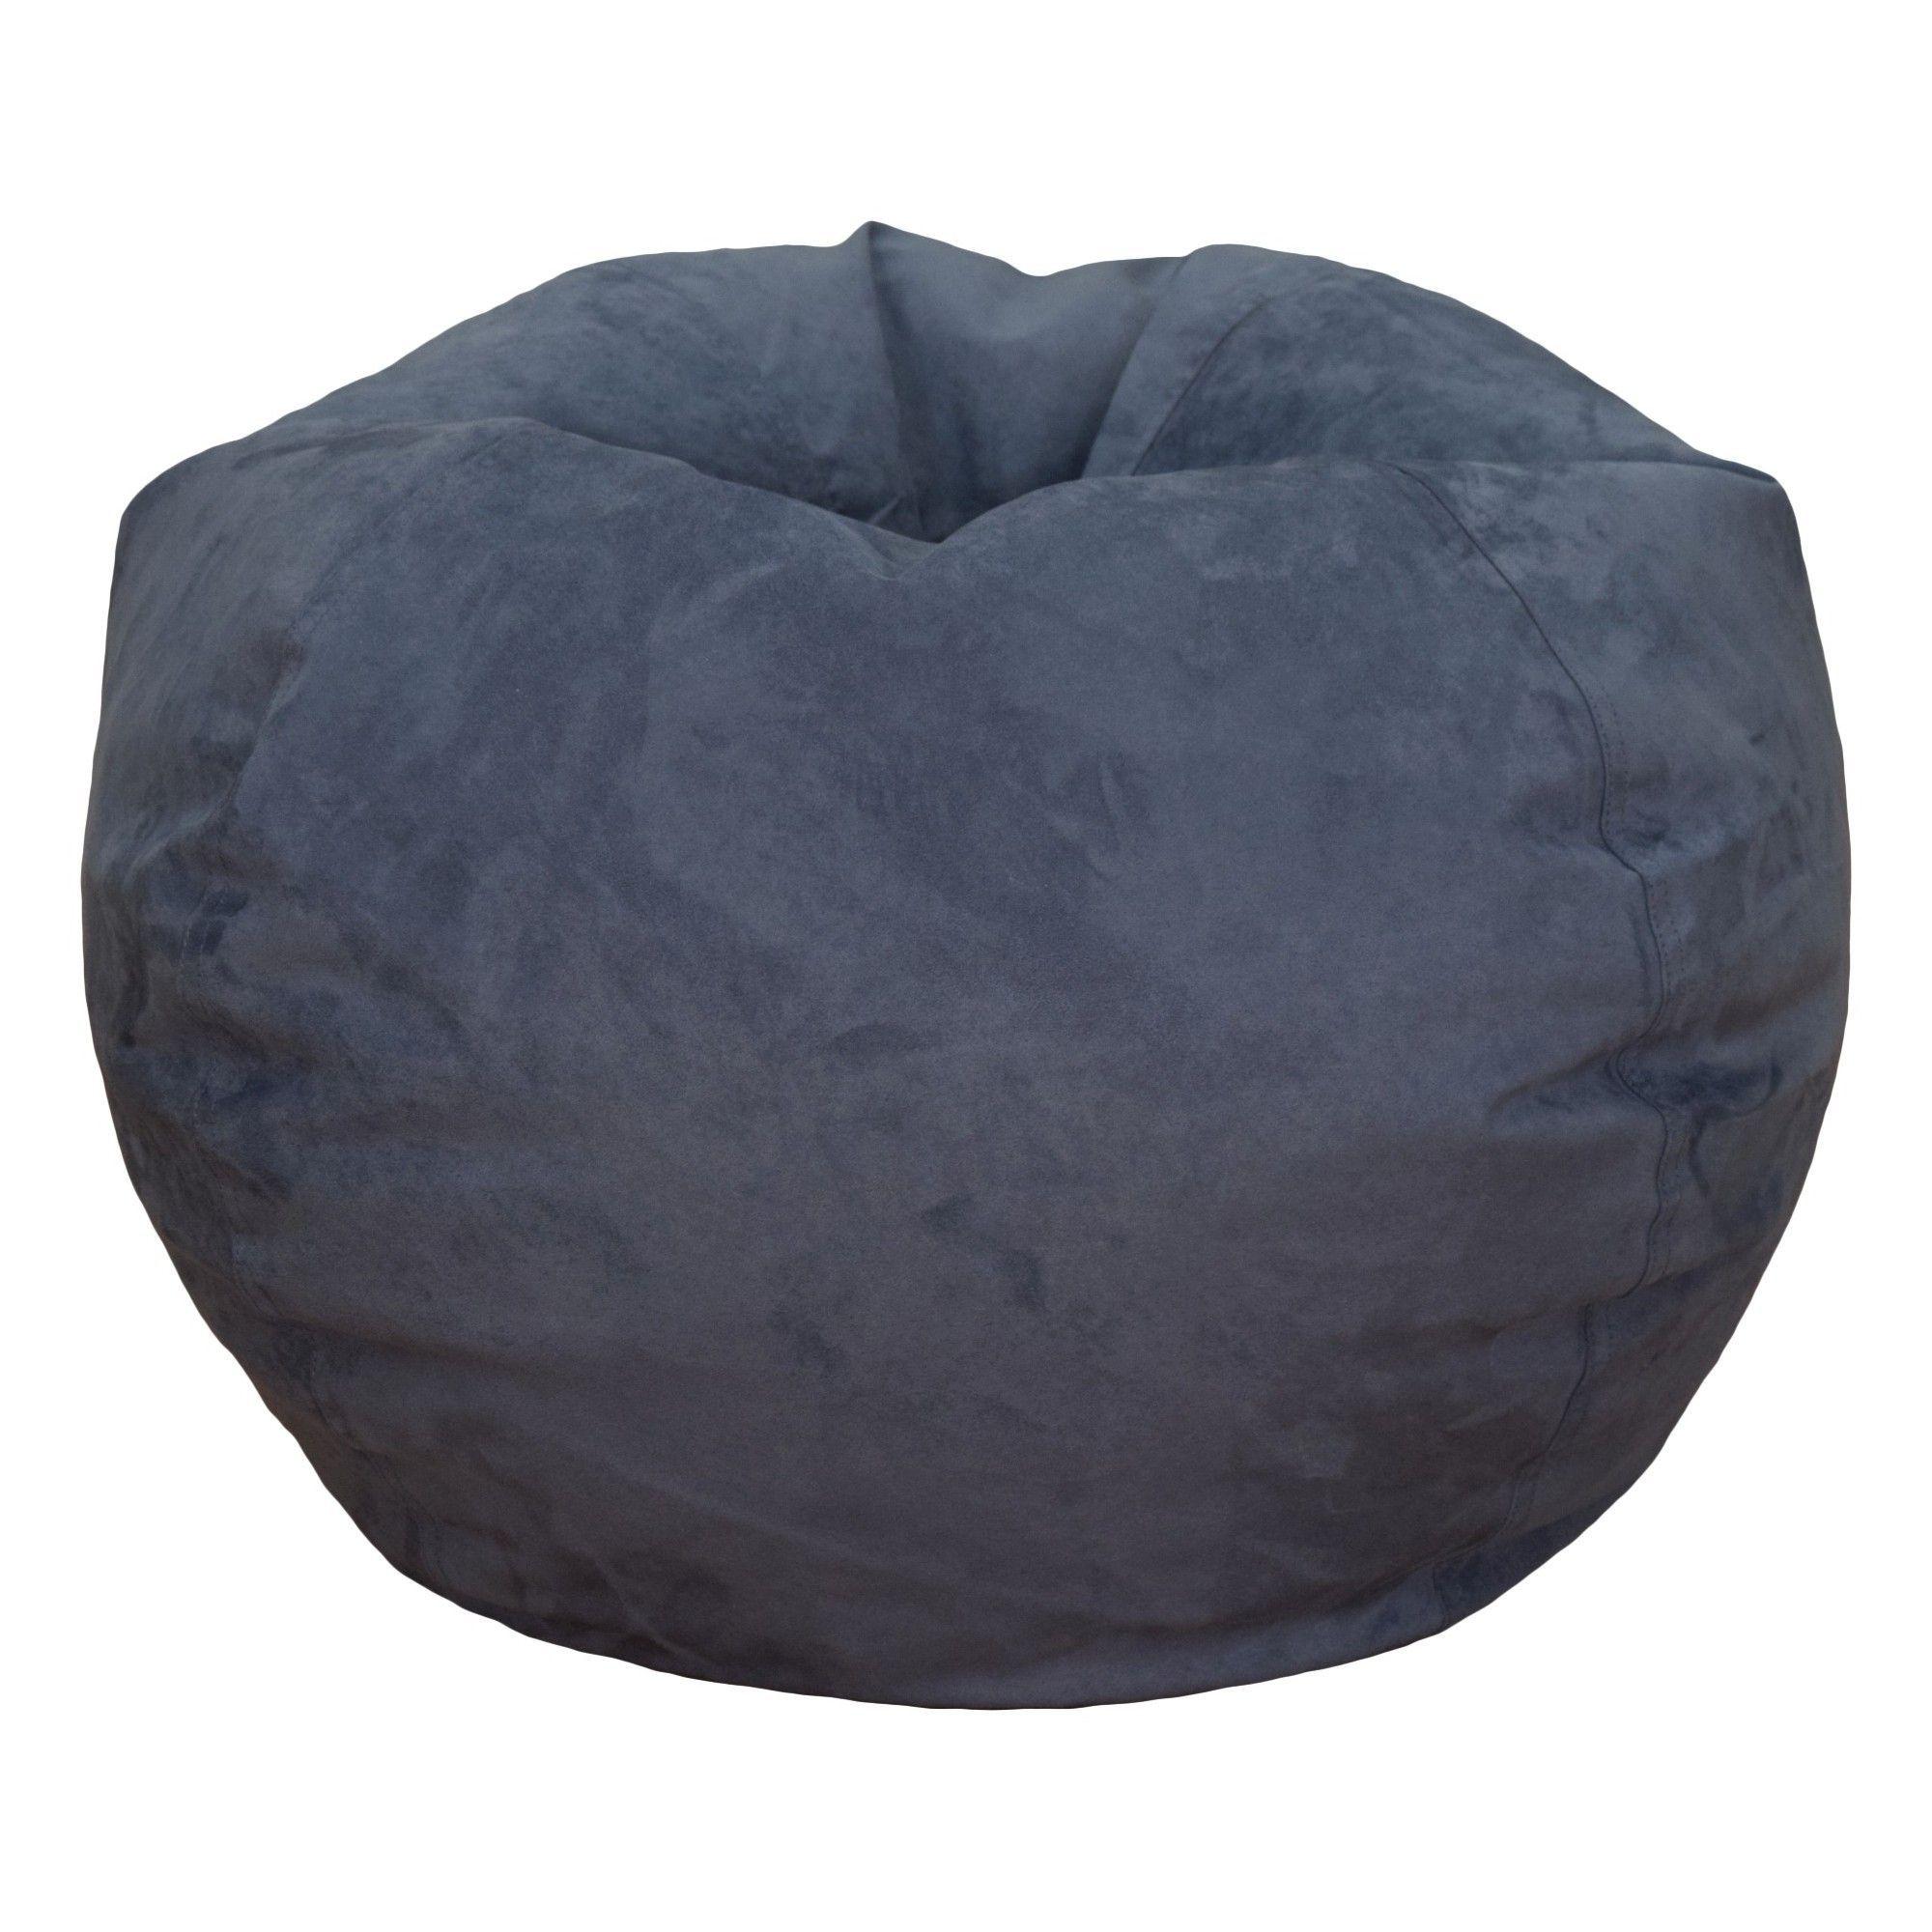 Bean Bag Chair Dark Blue Reservation Seating, Adult